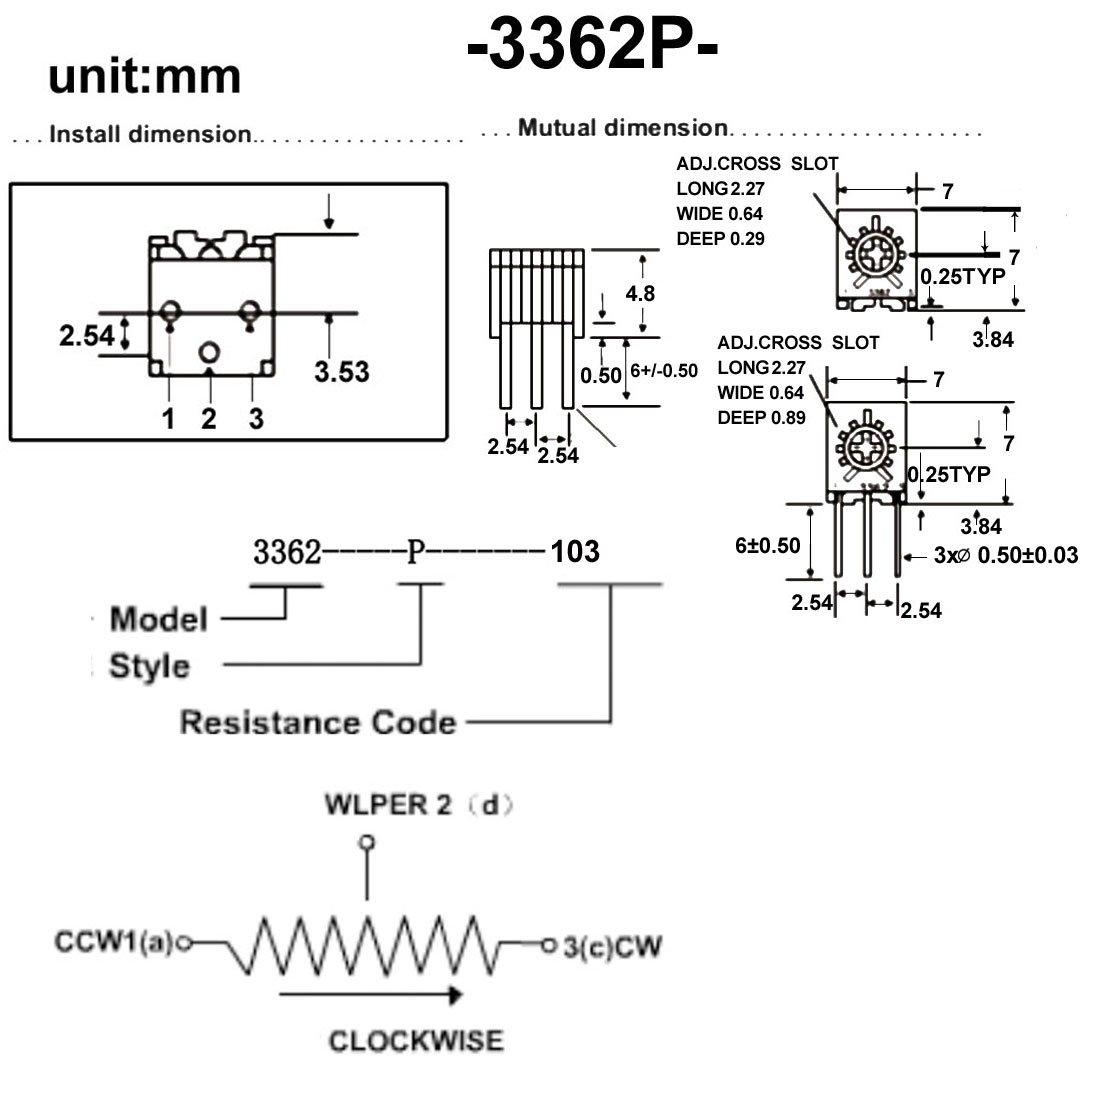 uxcell Resistors 10k Ohm Top Adjustment Horizontal Cermet Potentiometer 2 Pcs